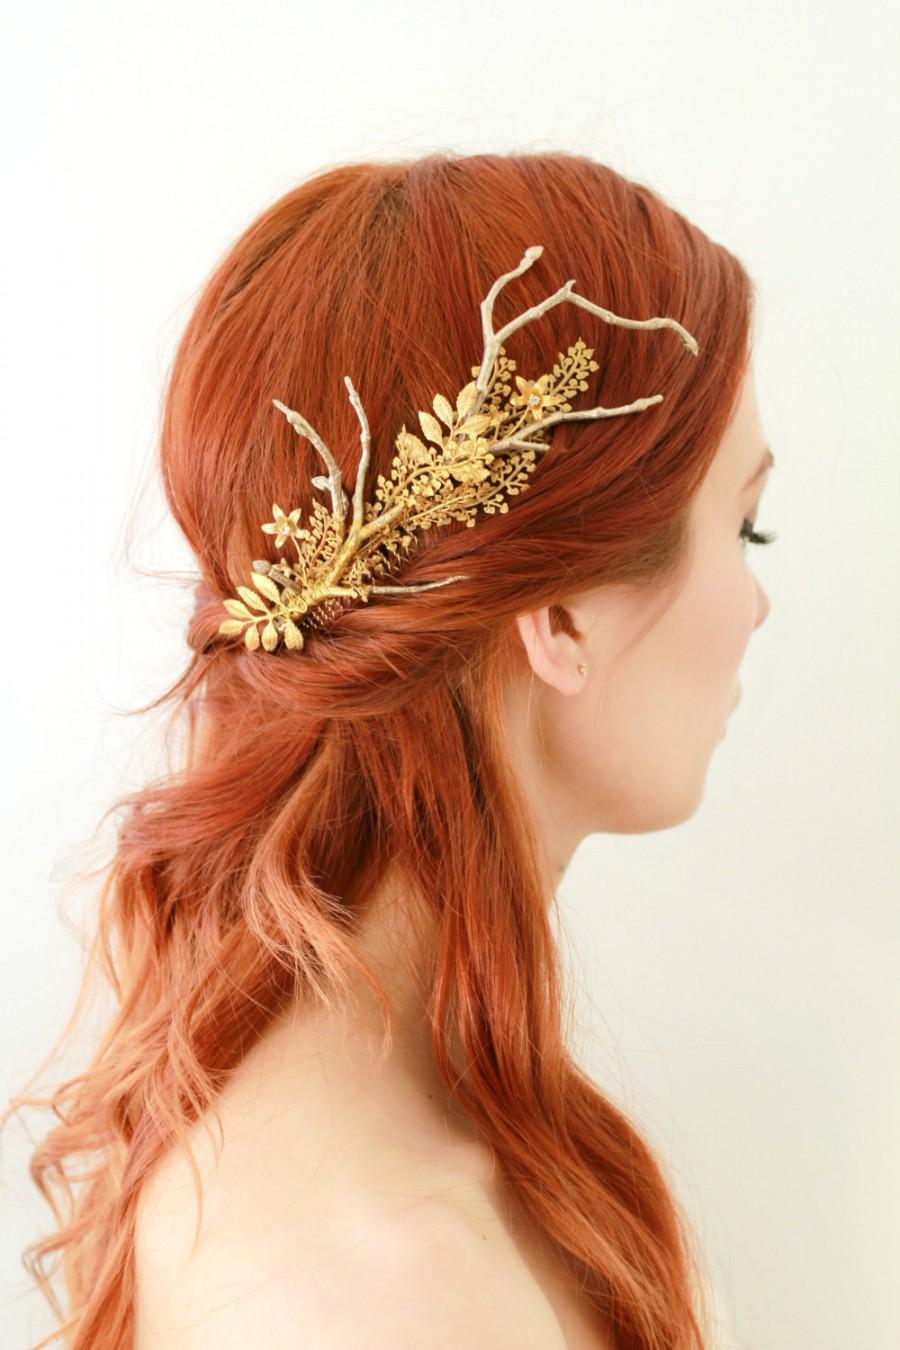 Mariage - Golden hair comb, gilded leaf comb, bridal headpiece, golden leaf headpiece, rustic wedding, boho bridal comb, woodland wedding hair comb